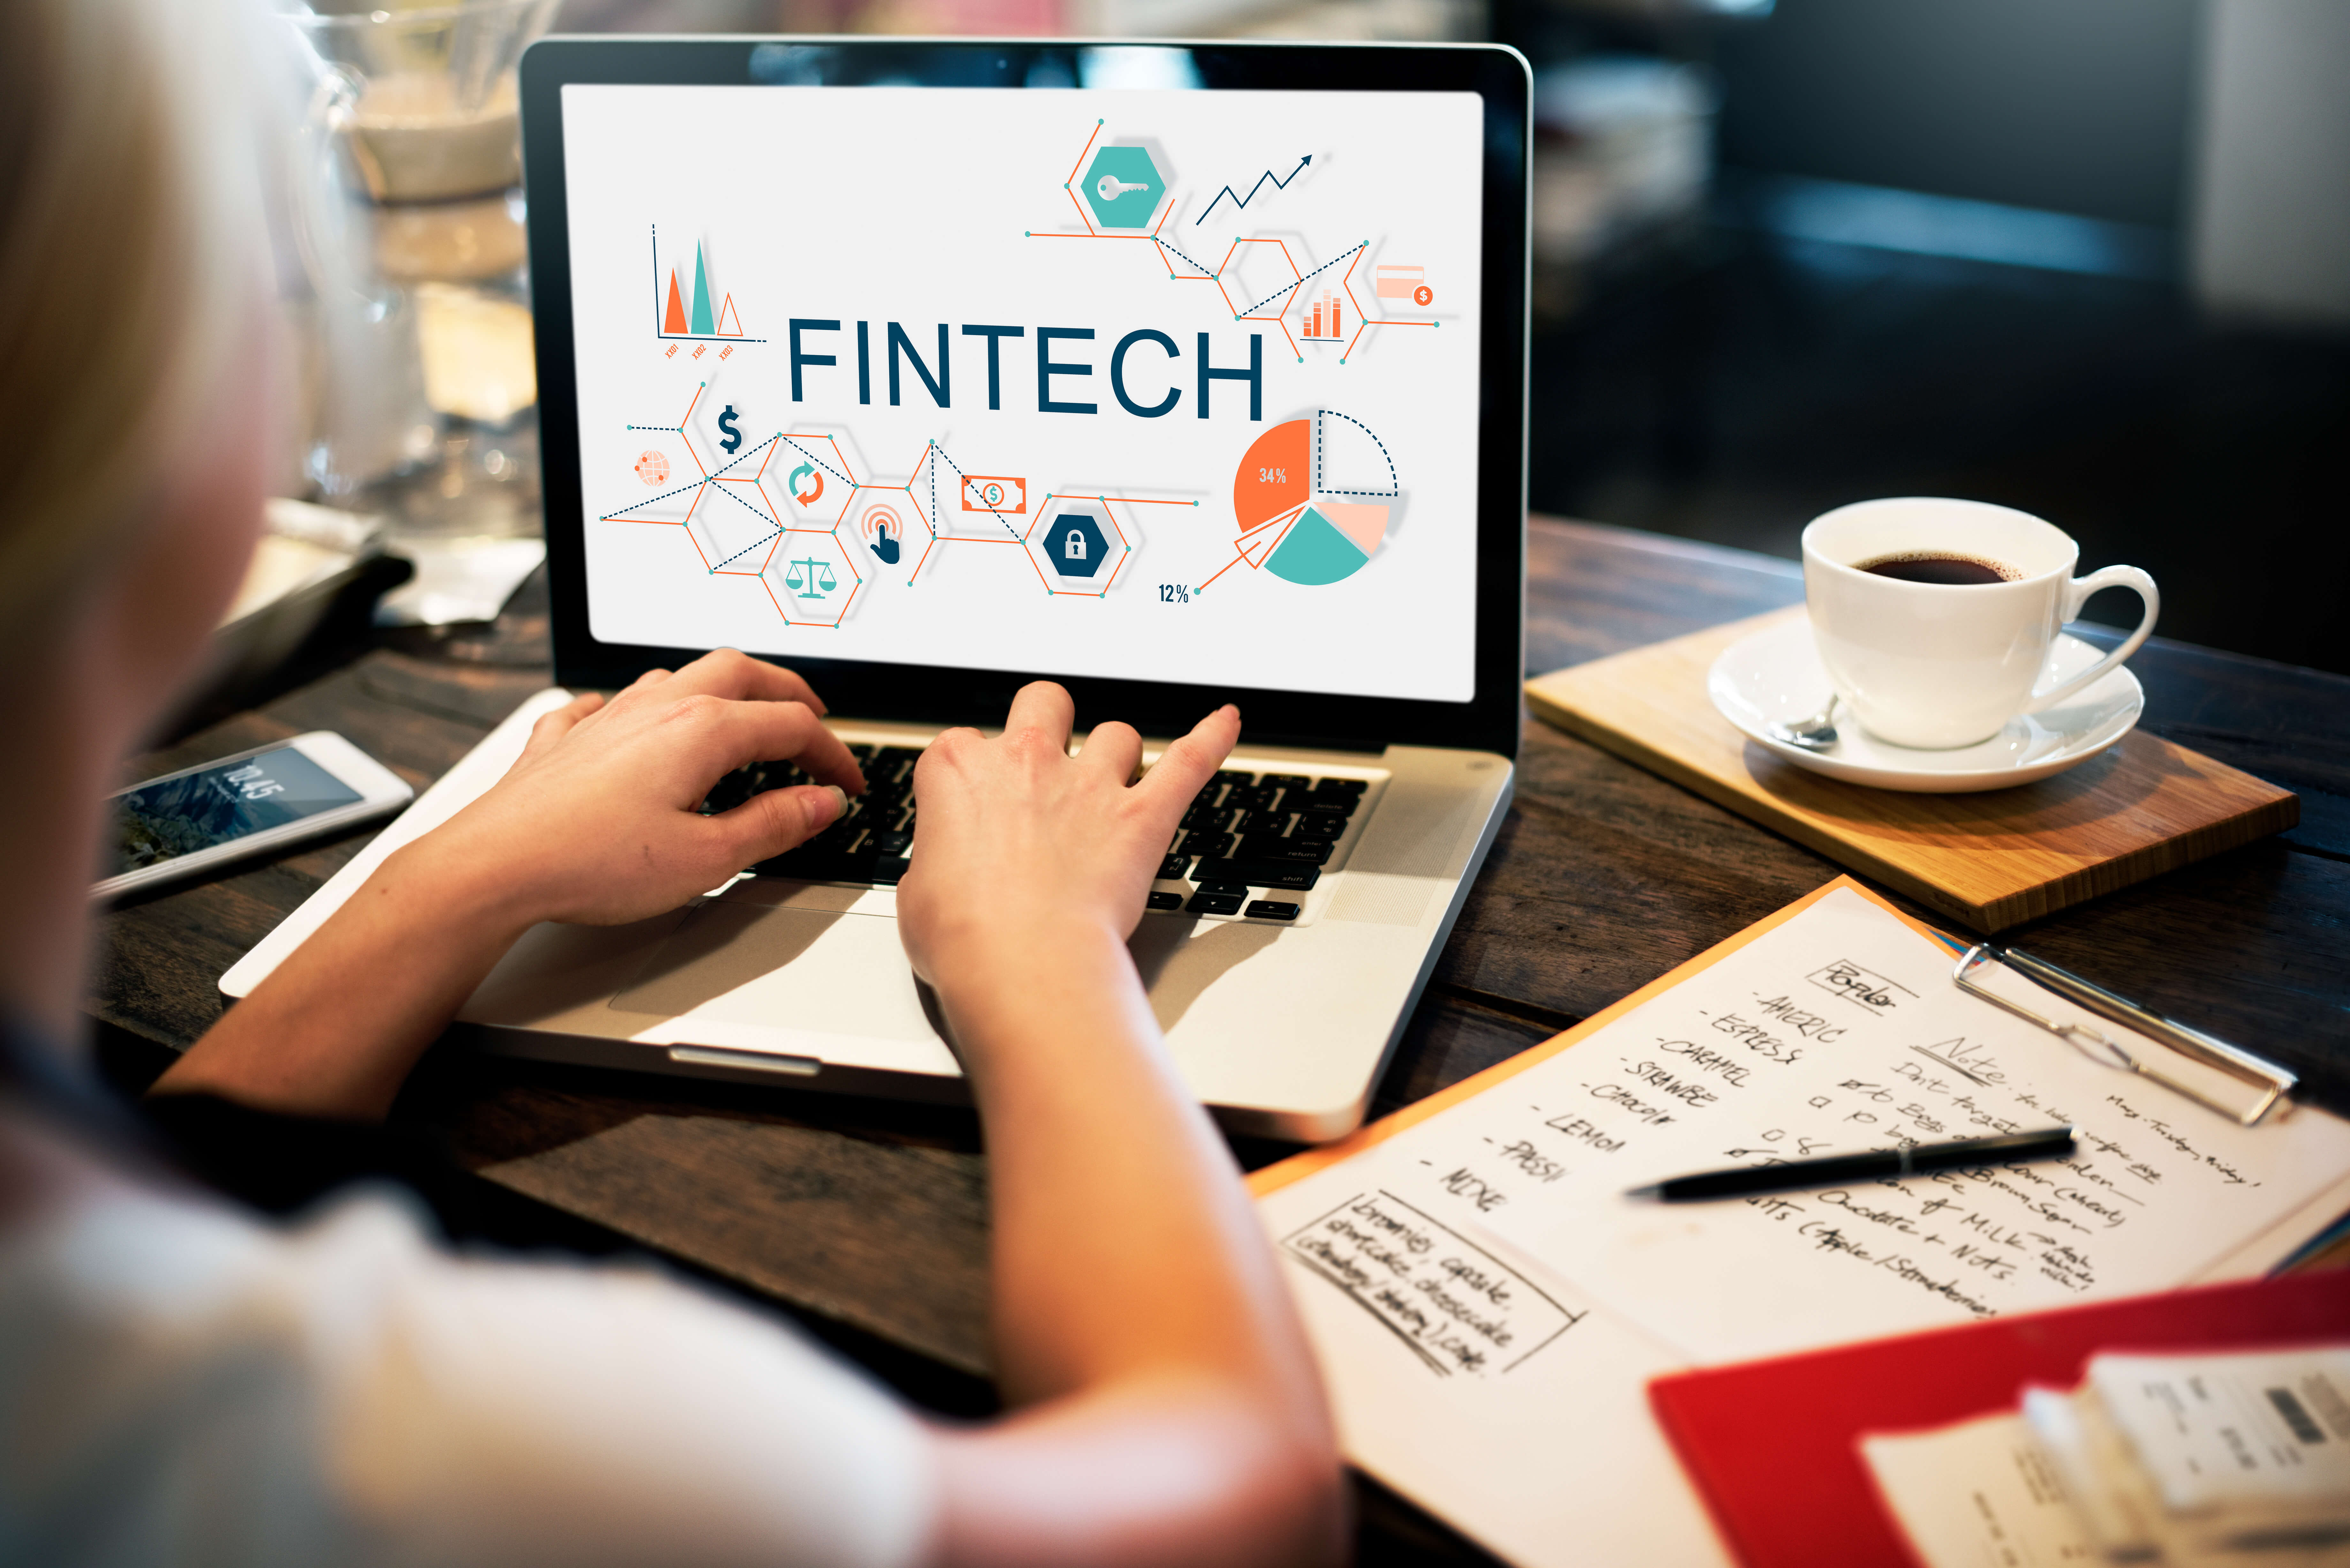 Ventajas de la Fintech vs la Banca tradicional